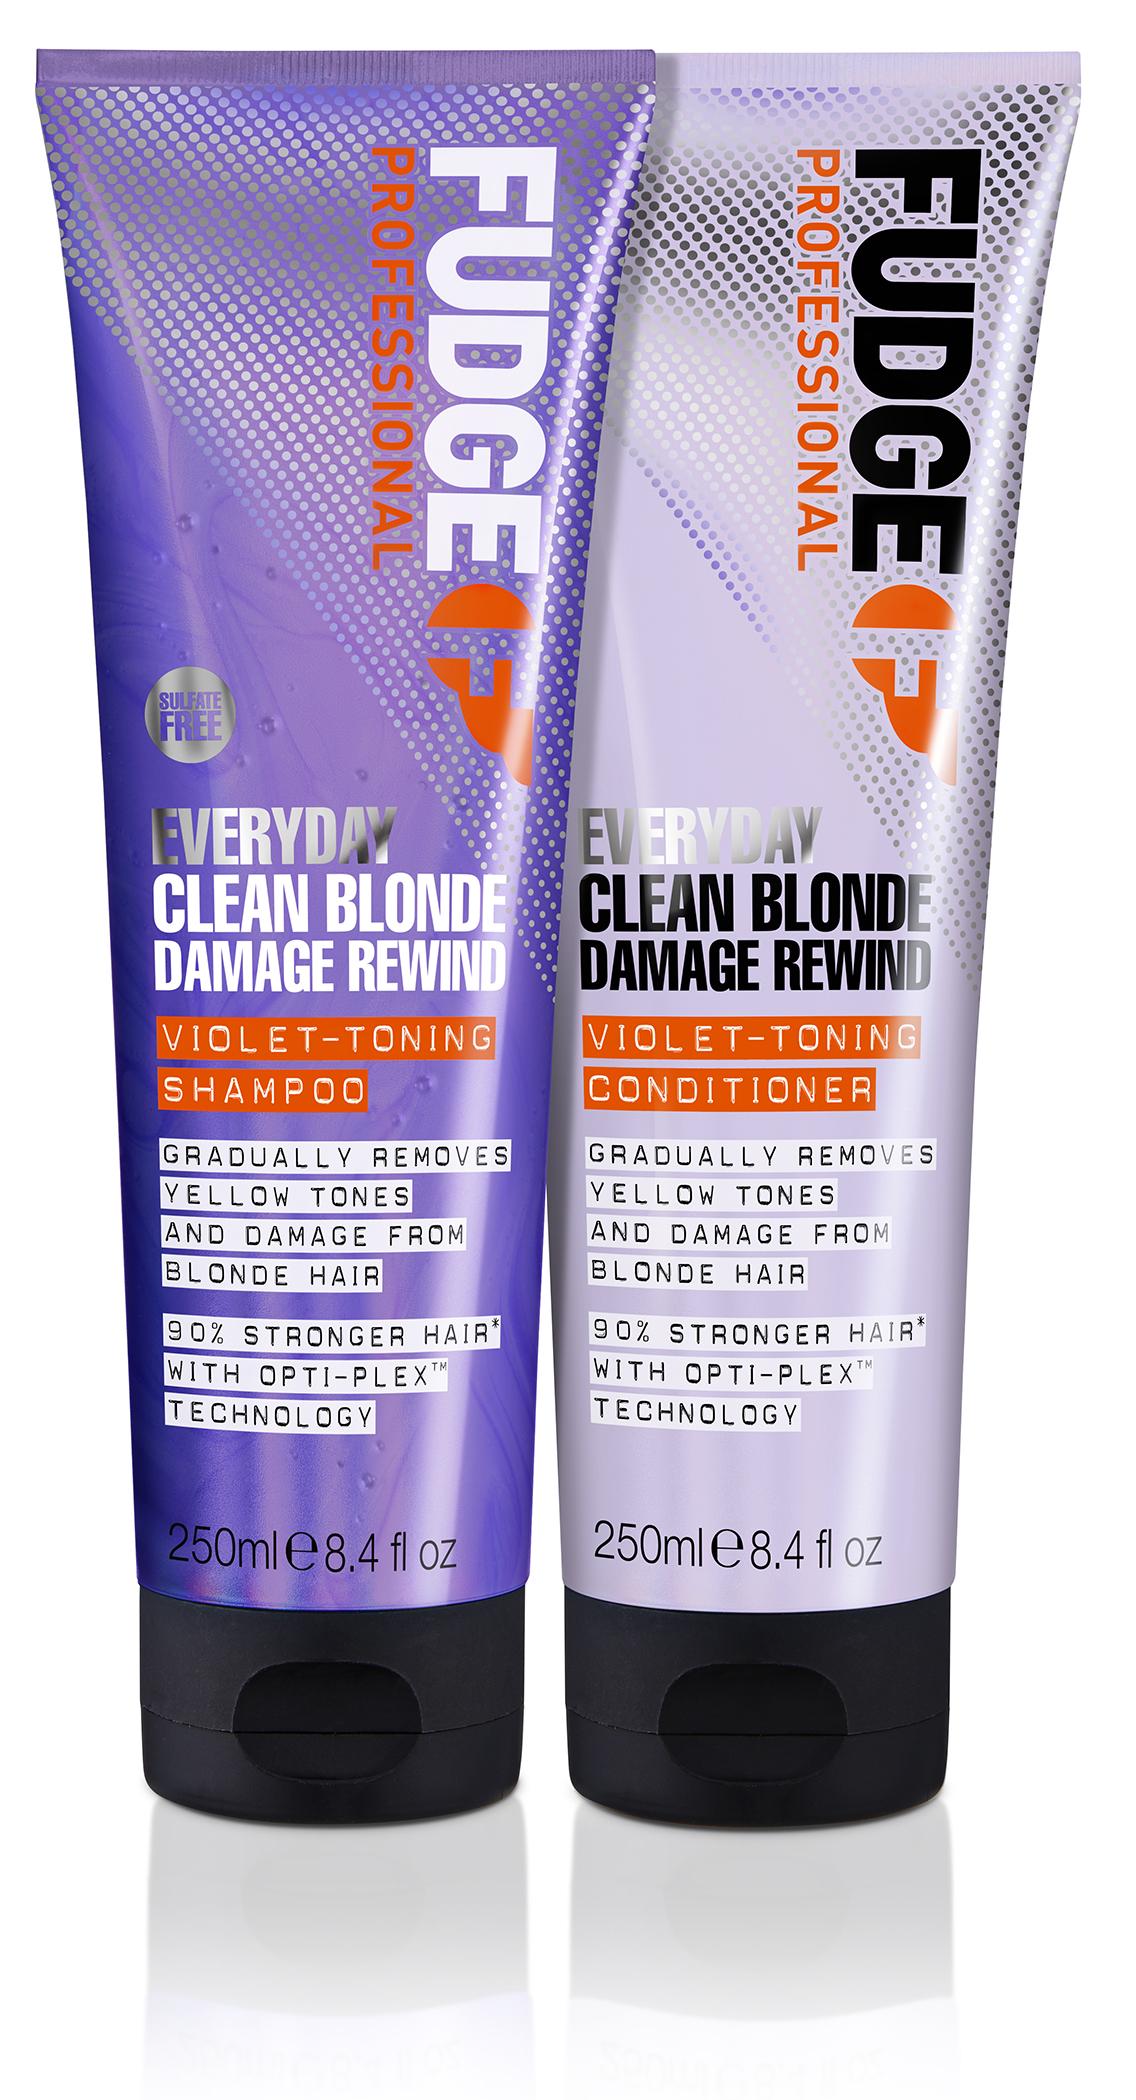 Fudge Professional Everyday Clean Blonde Damage Rewind